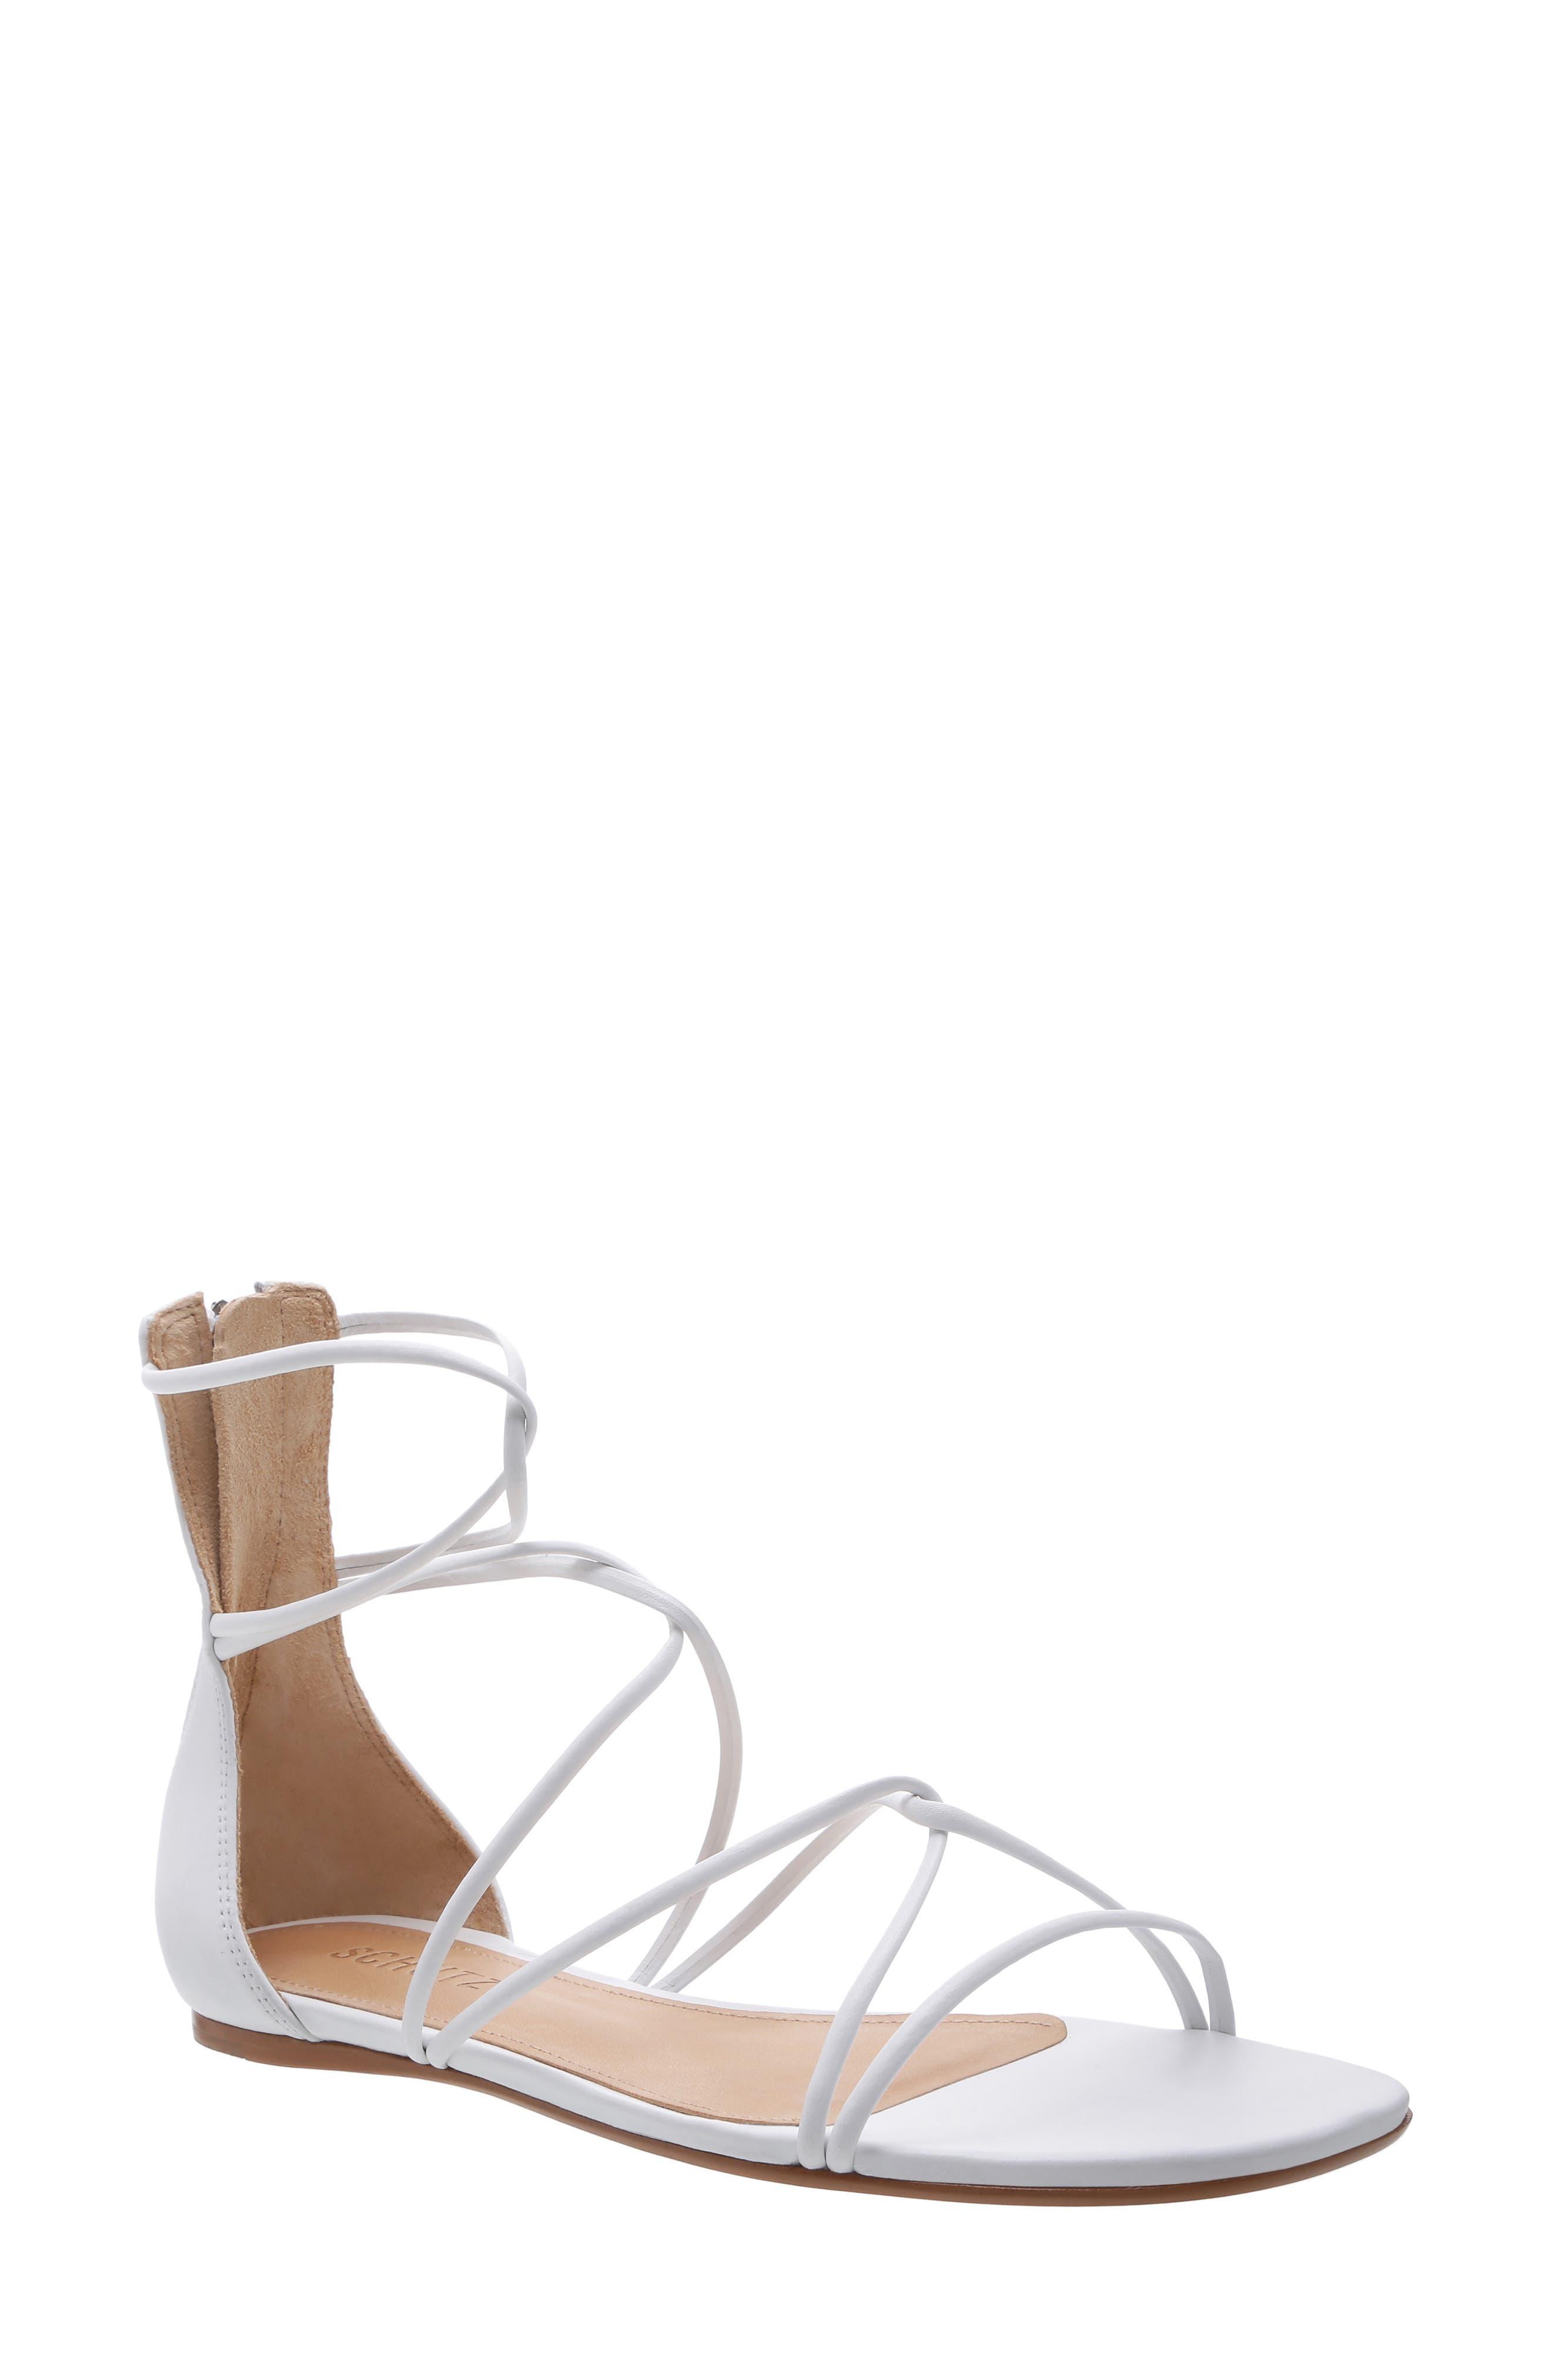 Schutz Fabia Strappy Sandal, White